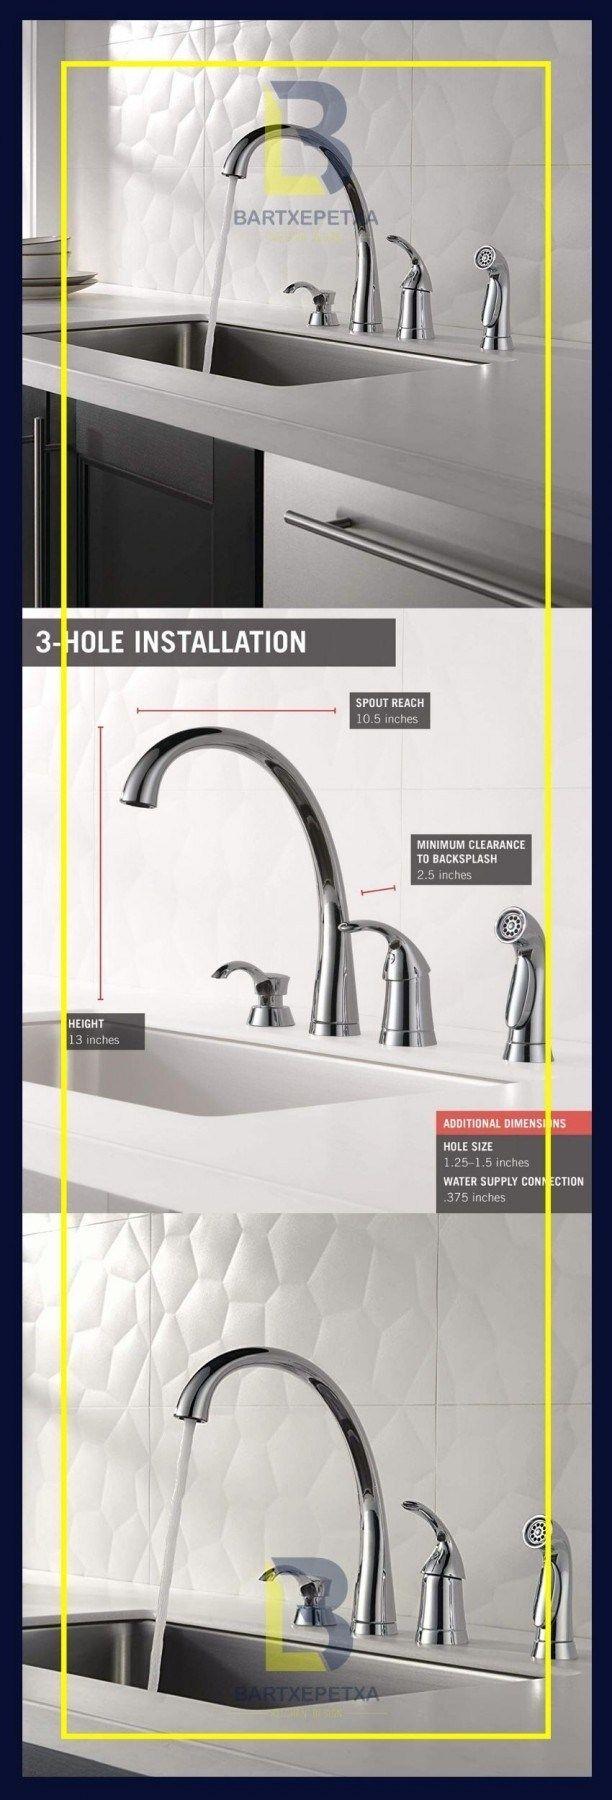 Best Kitchen Sink Soap Dispenser Ideas Design Sink Soap Dispenser Best Kitchen Sinks Kitchen Soap Dispenser